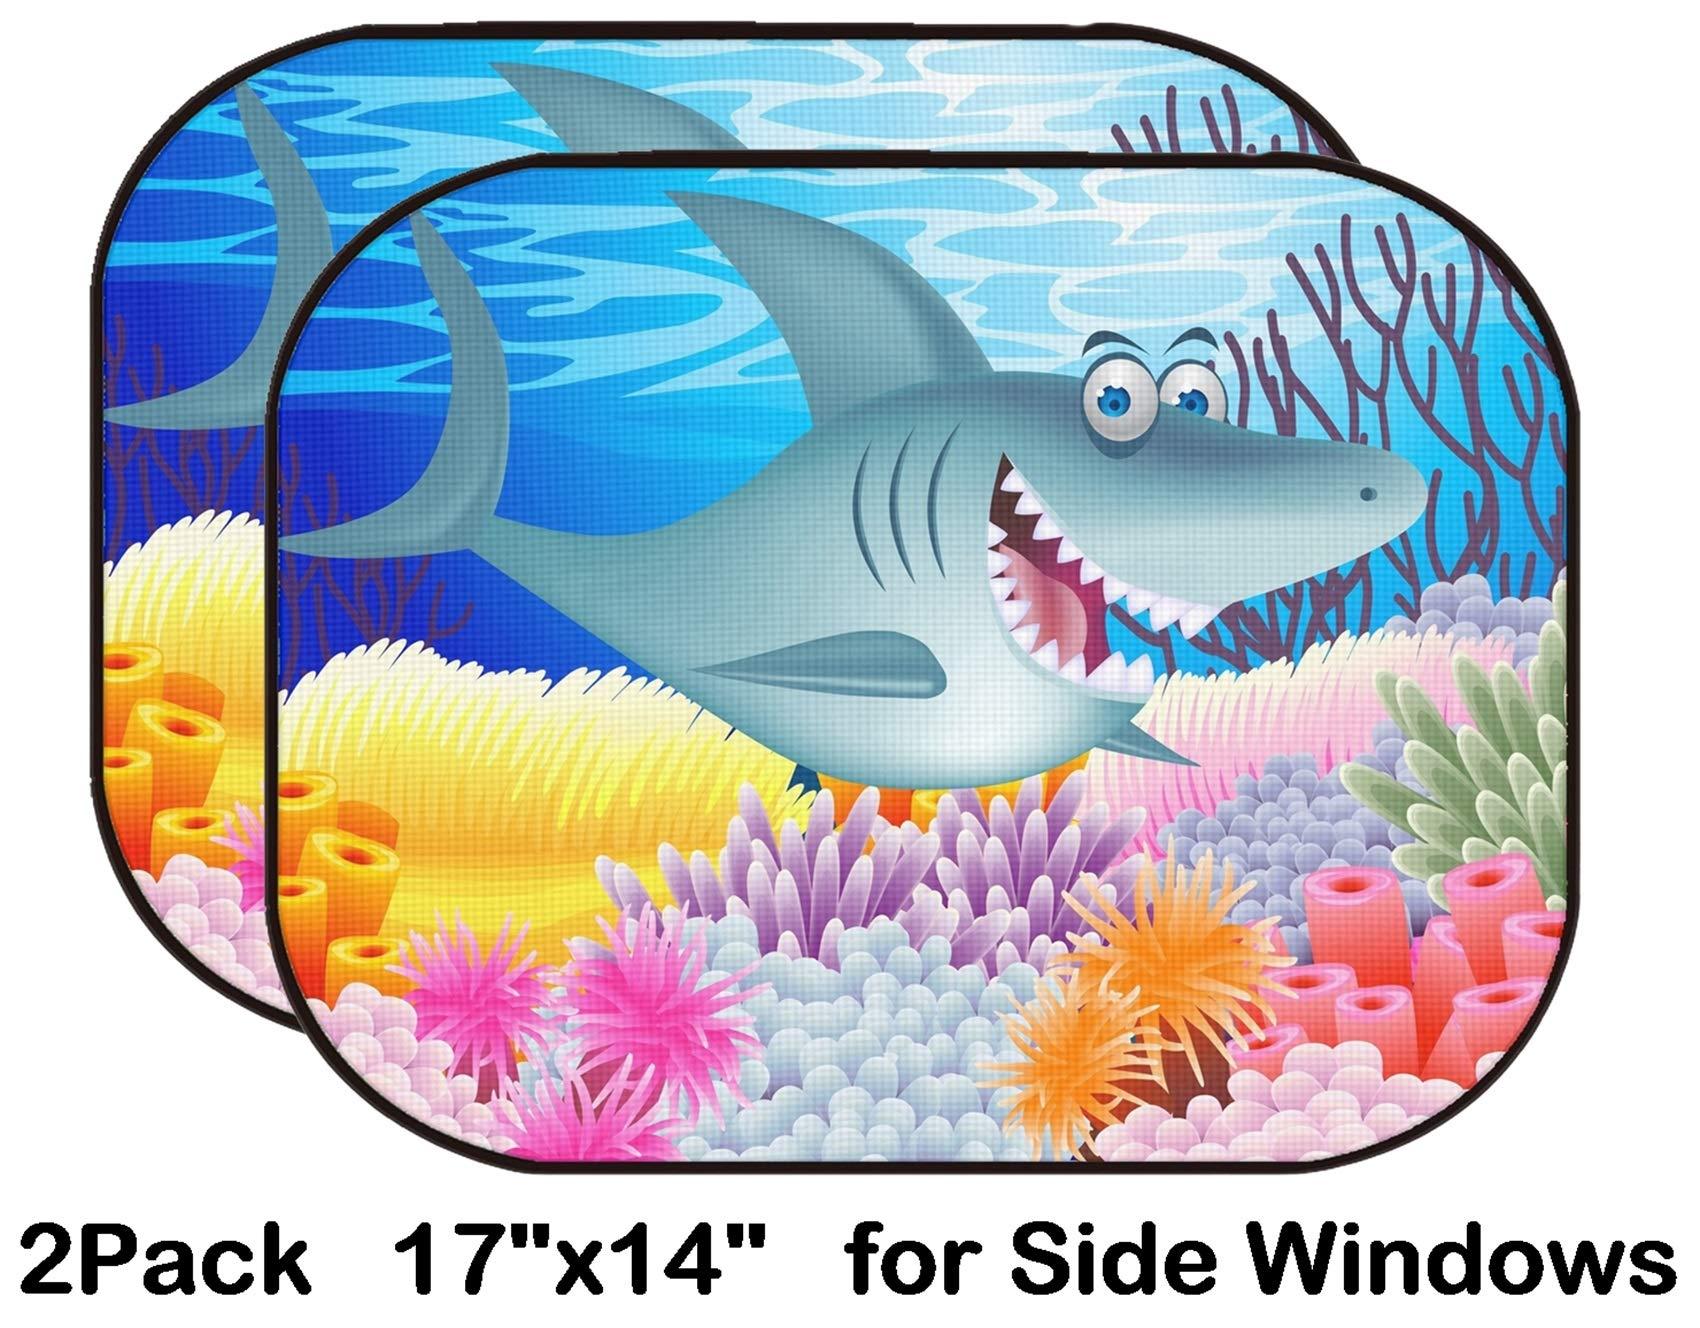 Liili Car Sun Shade for Side Rear Window Blocks UV Ray Sunlight Heat - Protect Baby and Pet - 2 Pack Shark Cartoon Photo 12152683 by Liili